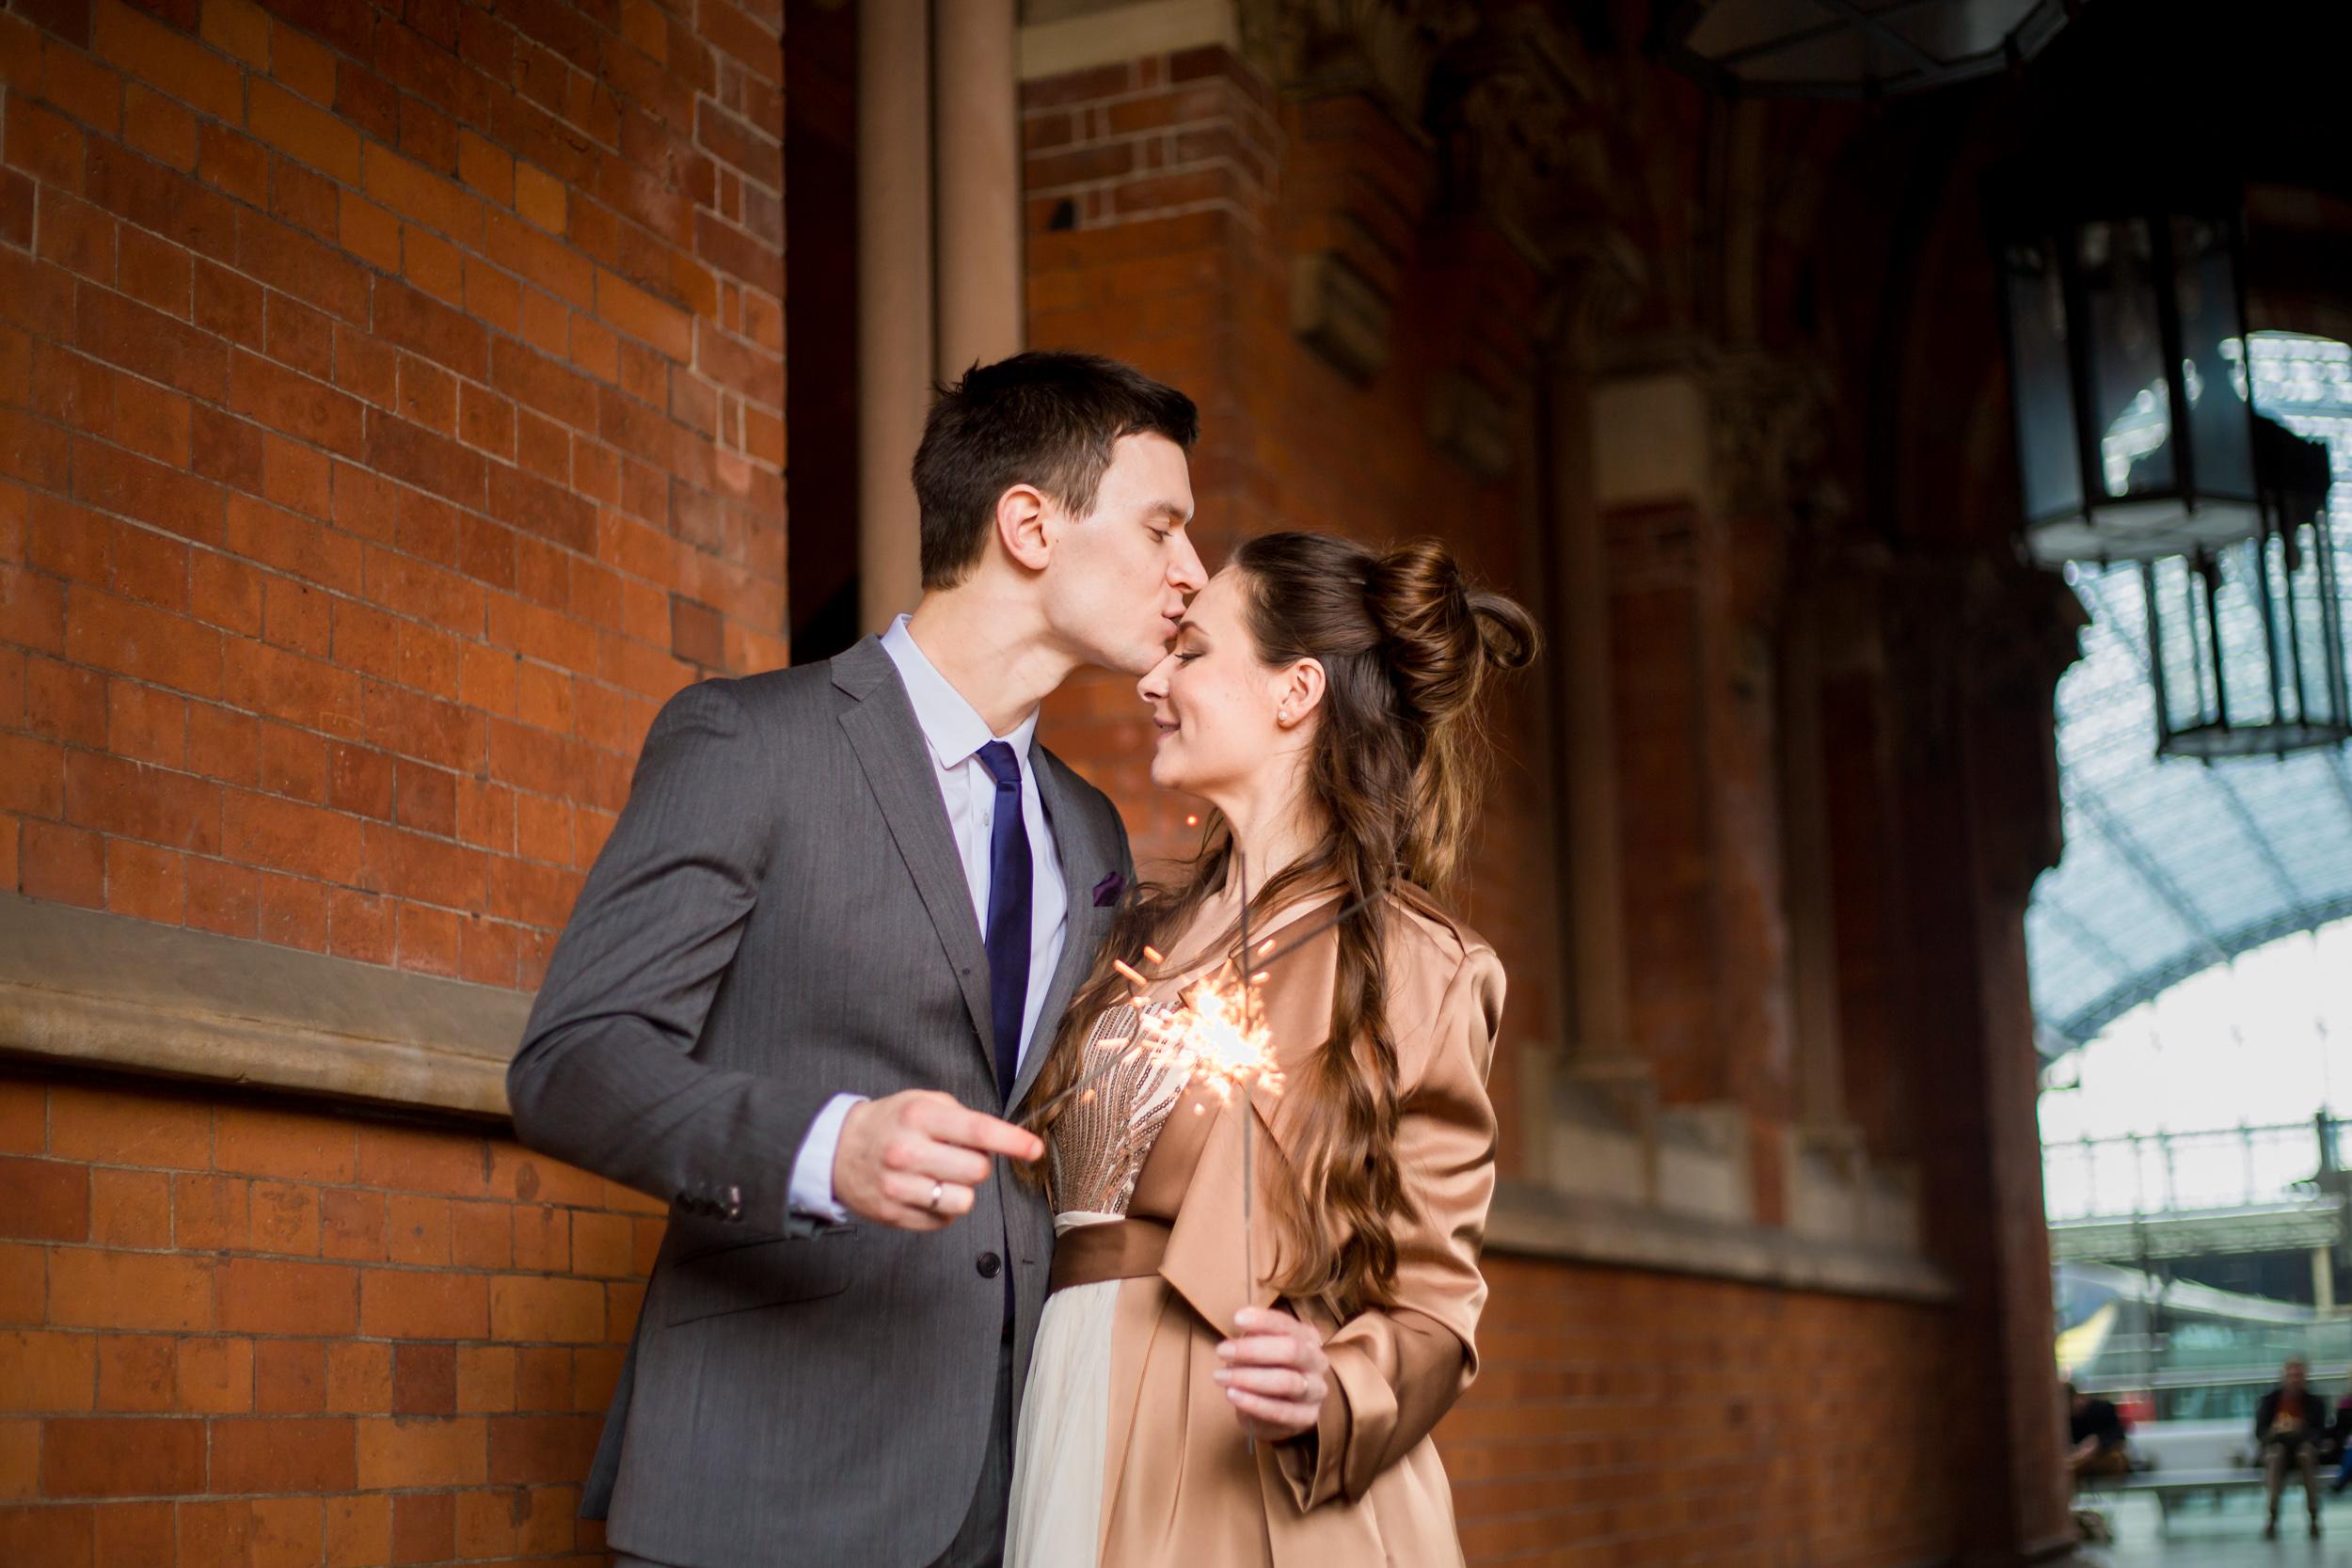 Dennis&Irina Engagement-15.jpg